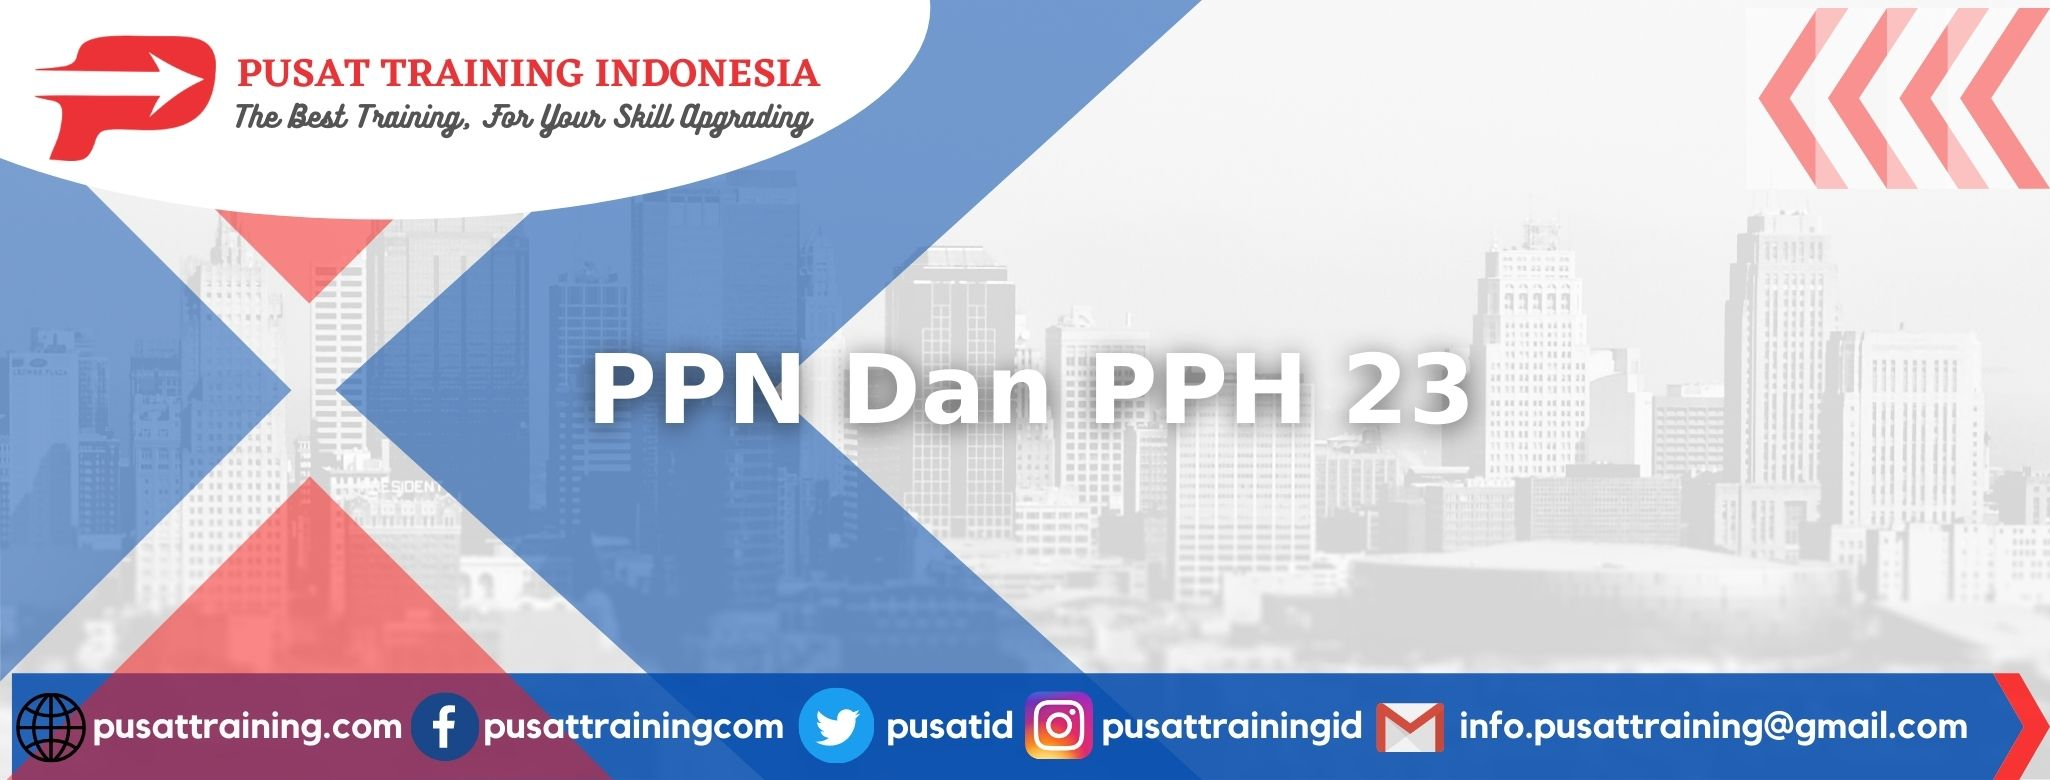 PPN-Dan-PPH-23